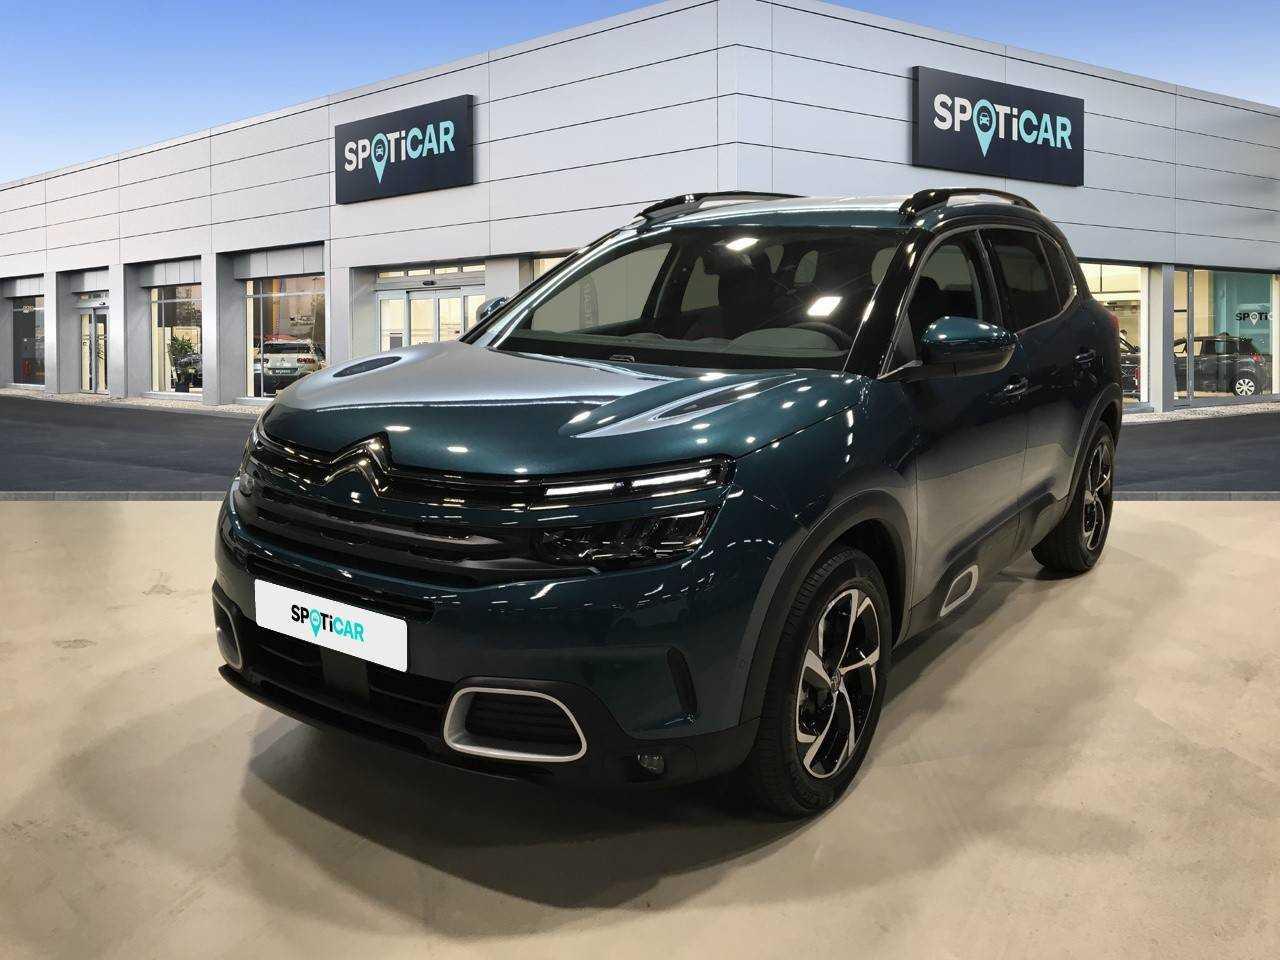 Citroën C5 Aircross ocasión segunda mano 2021 Diésel por 29.550€ en Madrid